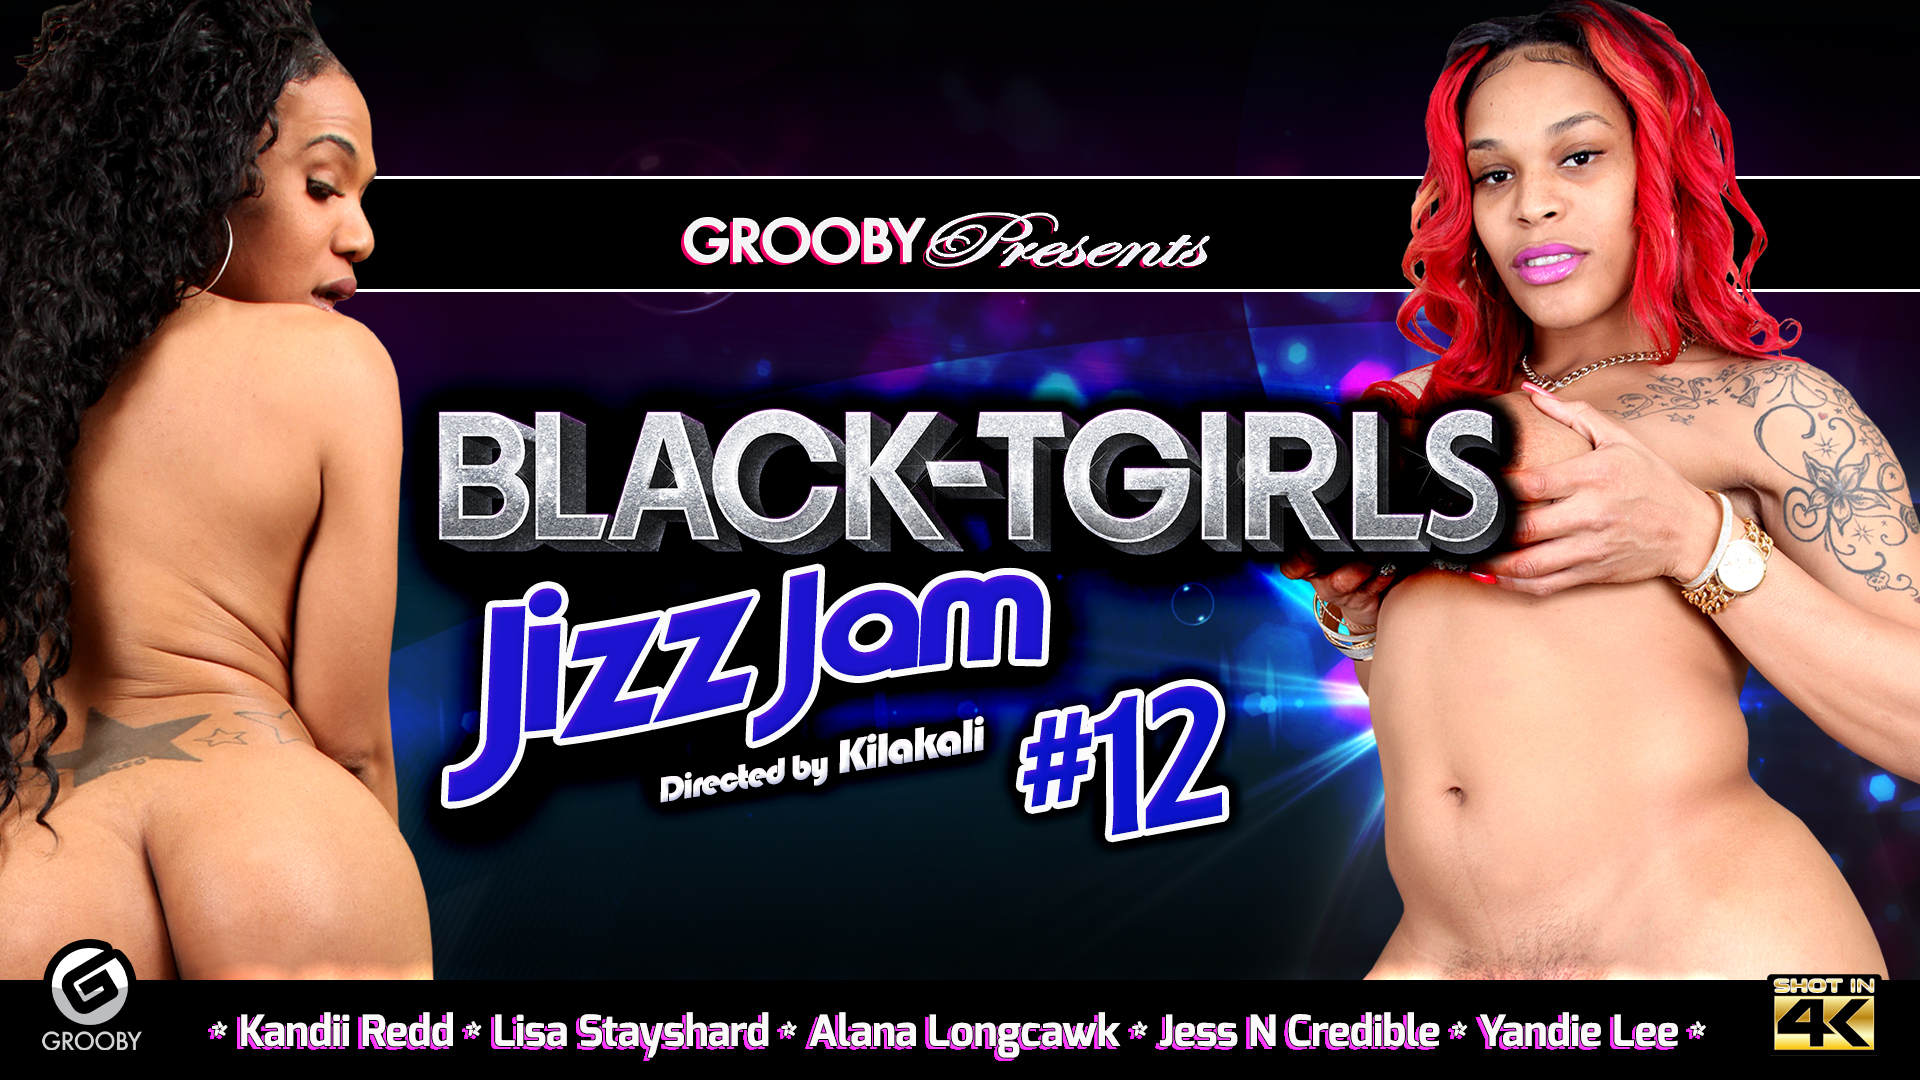 Black Tgirls JizzJam 12 DVD Trailer